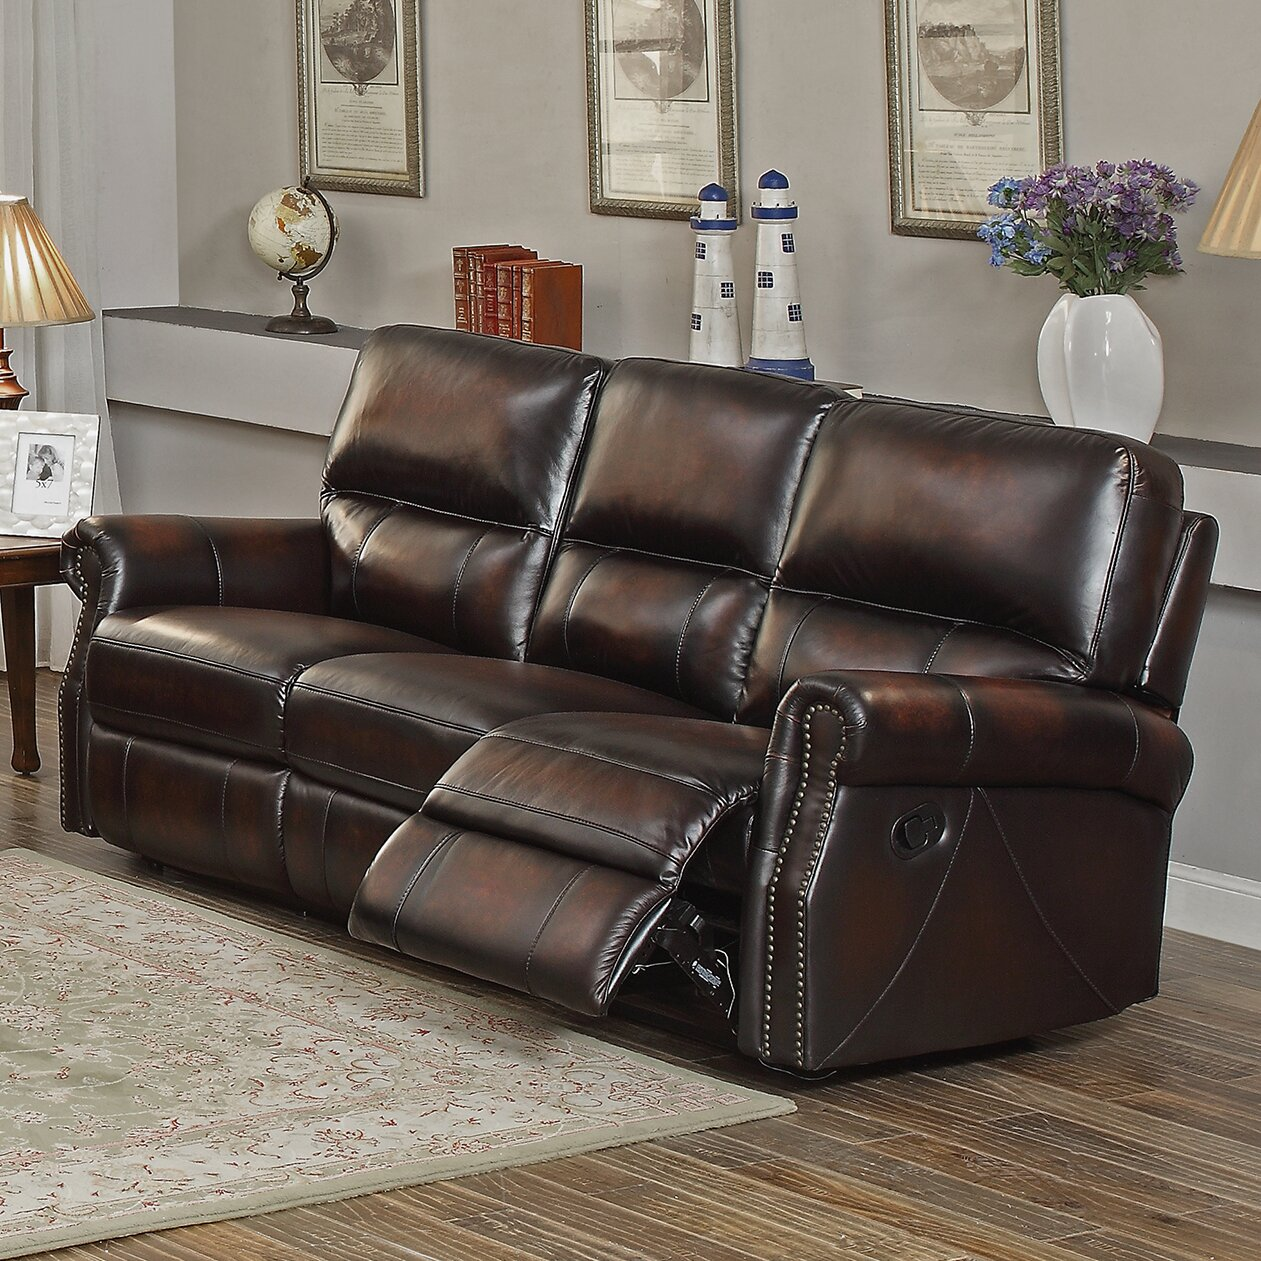 amax nevada 3 piece leather living room set wayfair. Black Bedroom Furniture Sets. Home Design Ideas